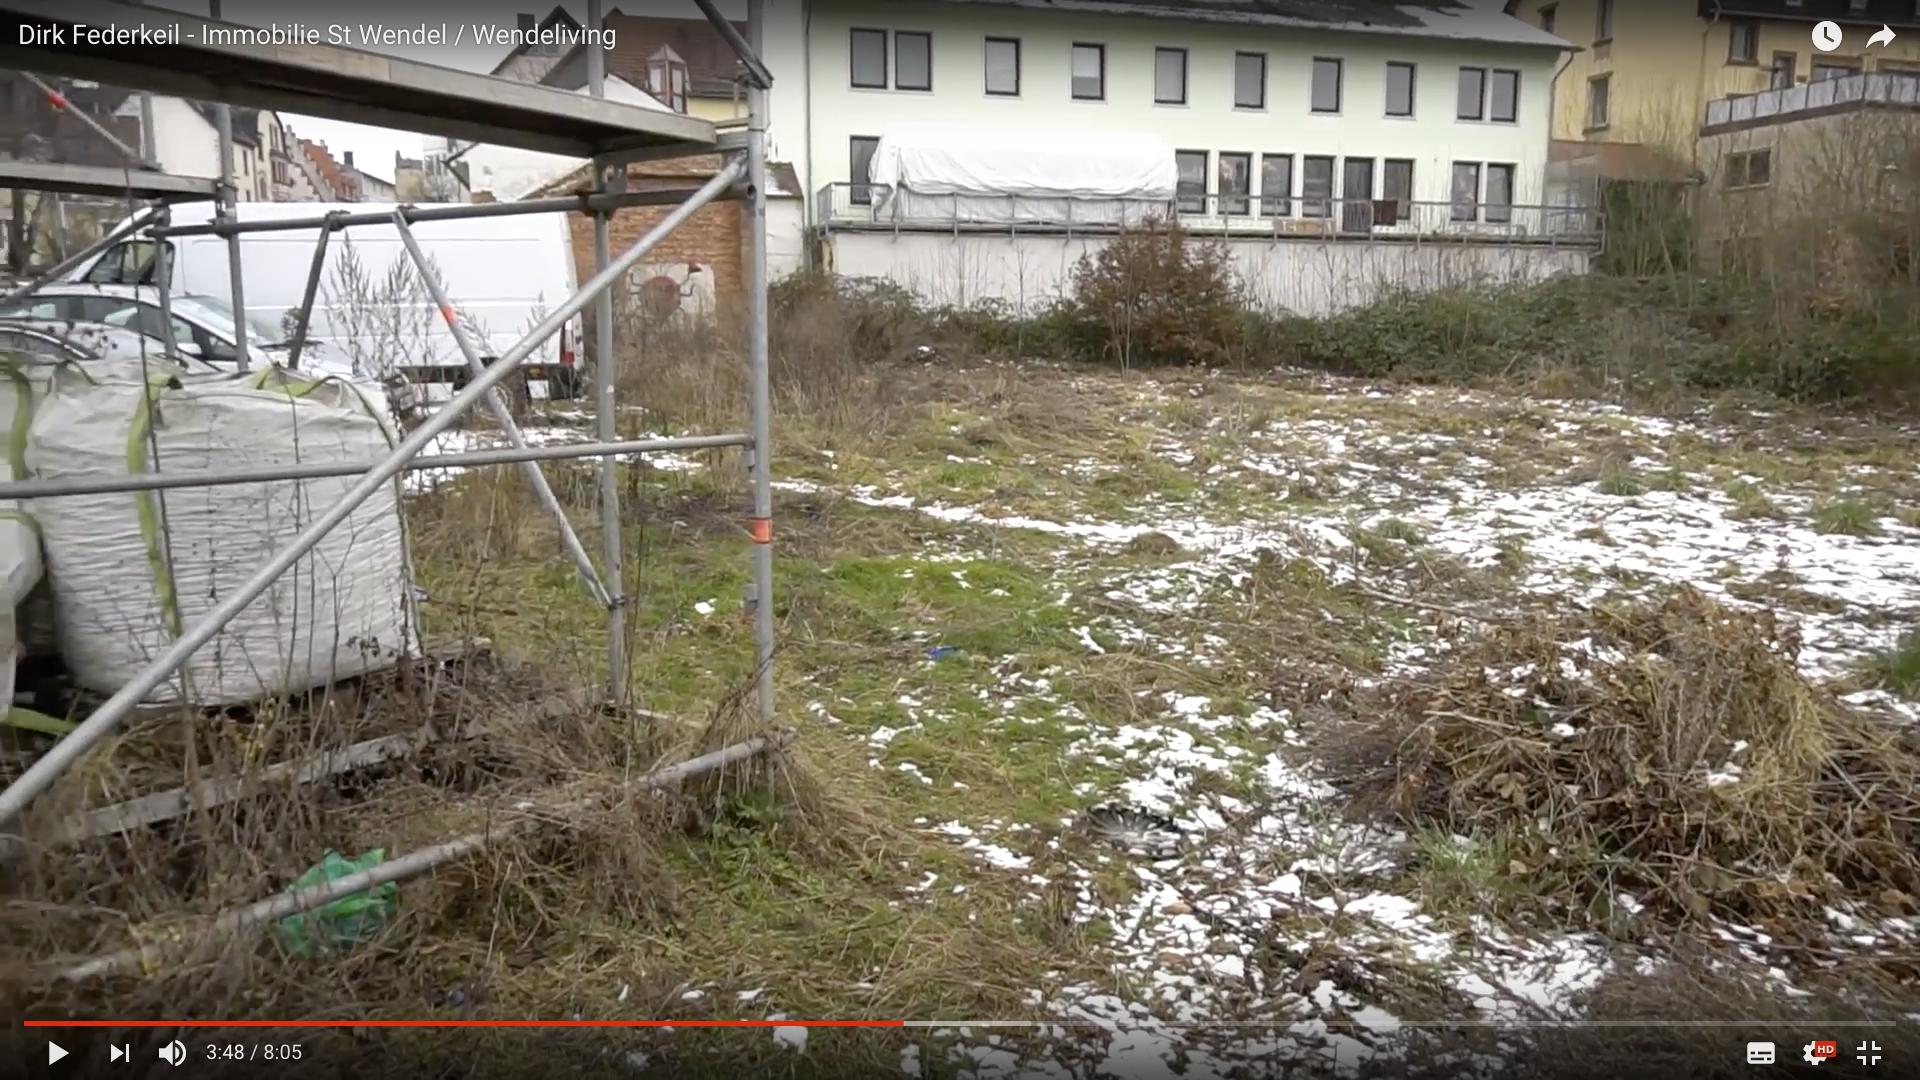 2017 Immobilie St Wendel : Wendeliving verwirklichungsort_MSM_MEDIEN_SAAR_MOSEL_SAARLAND_FERNSEHEN_1_ED_SAAR